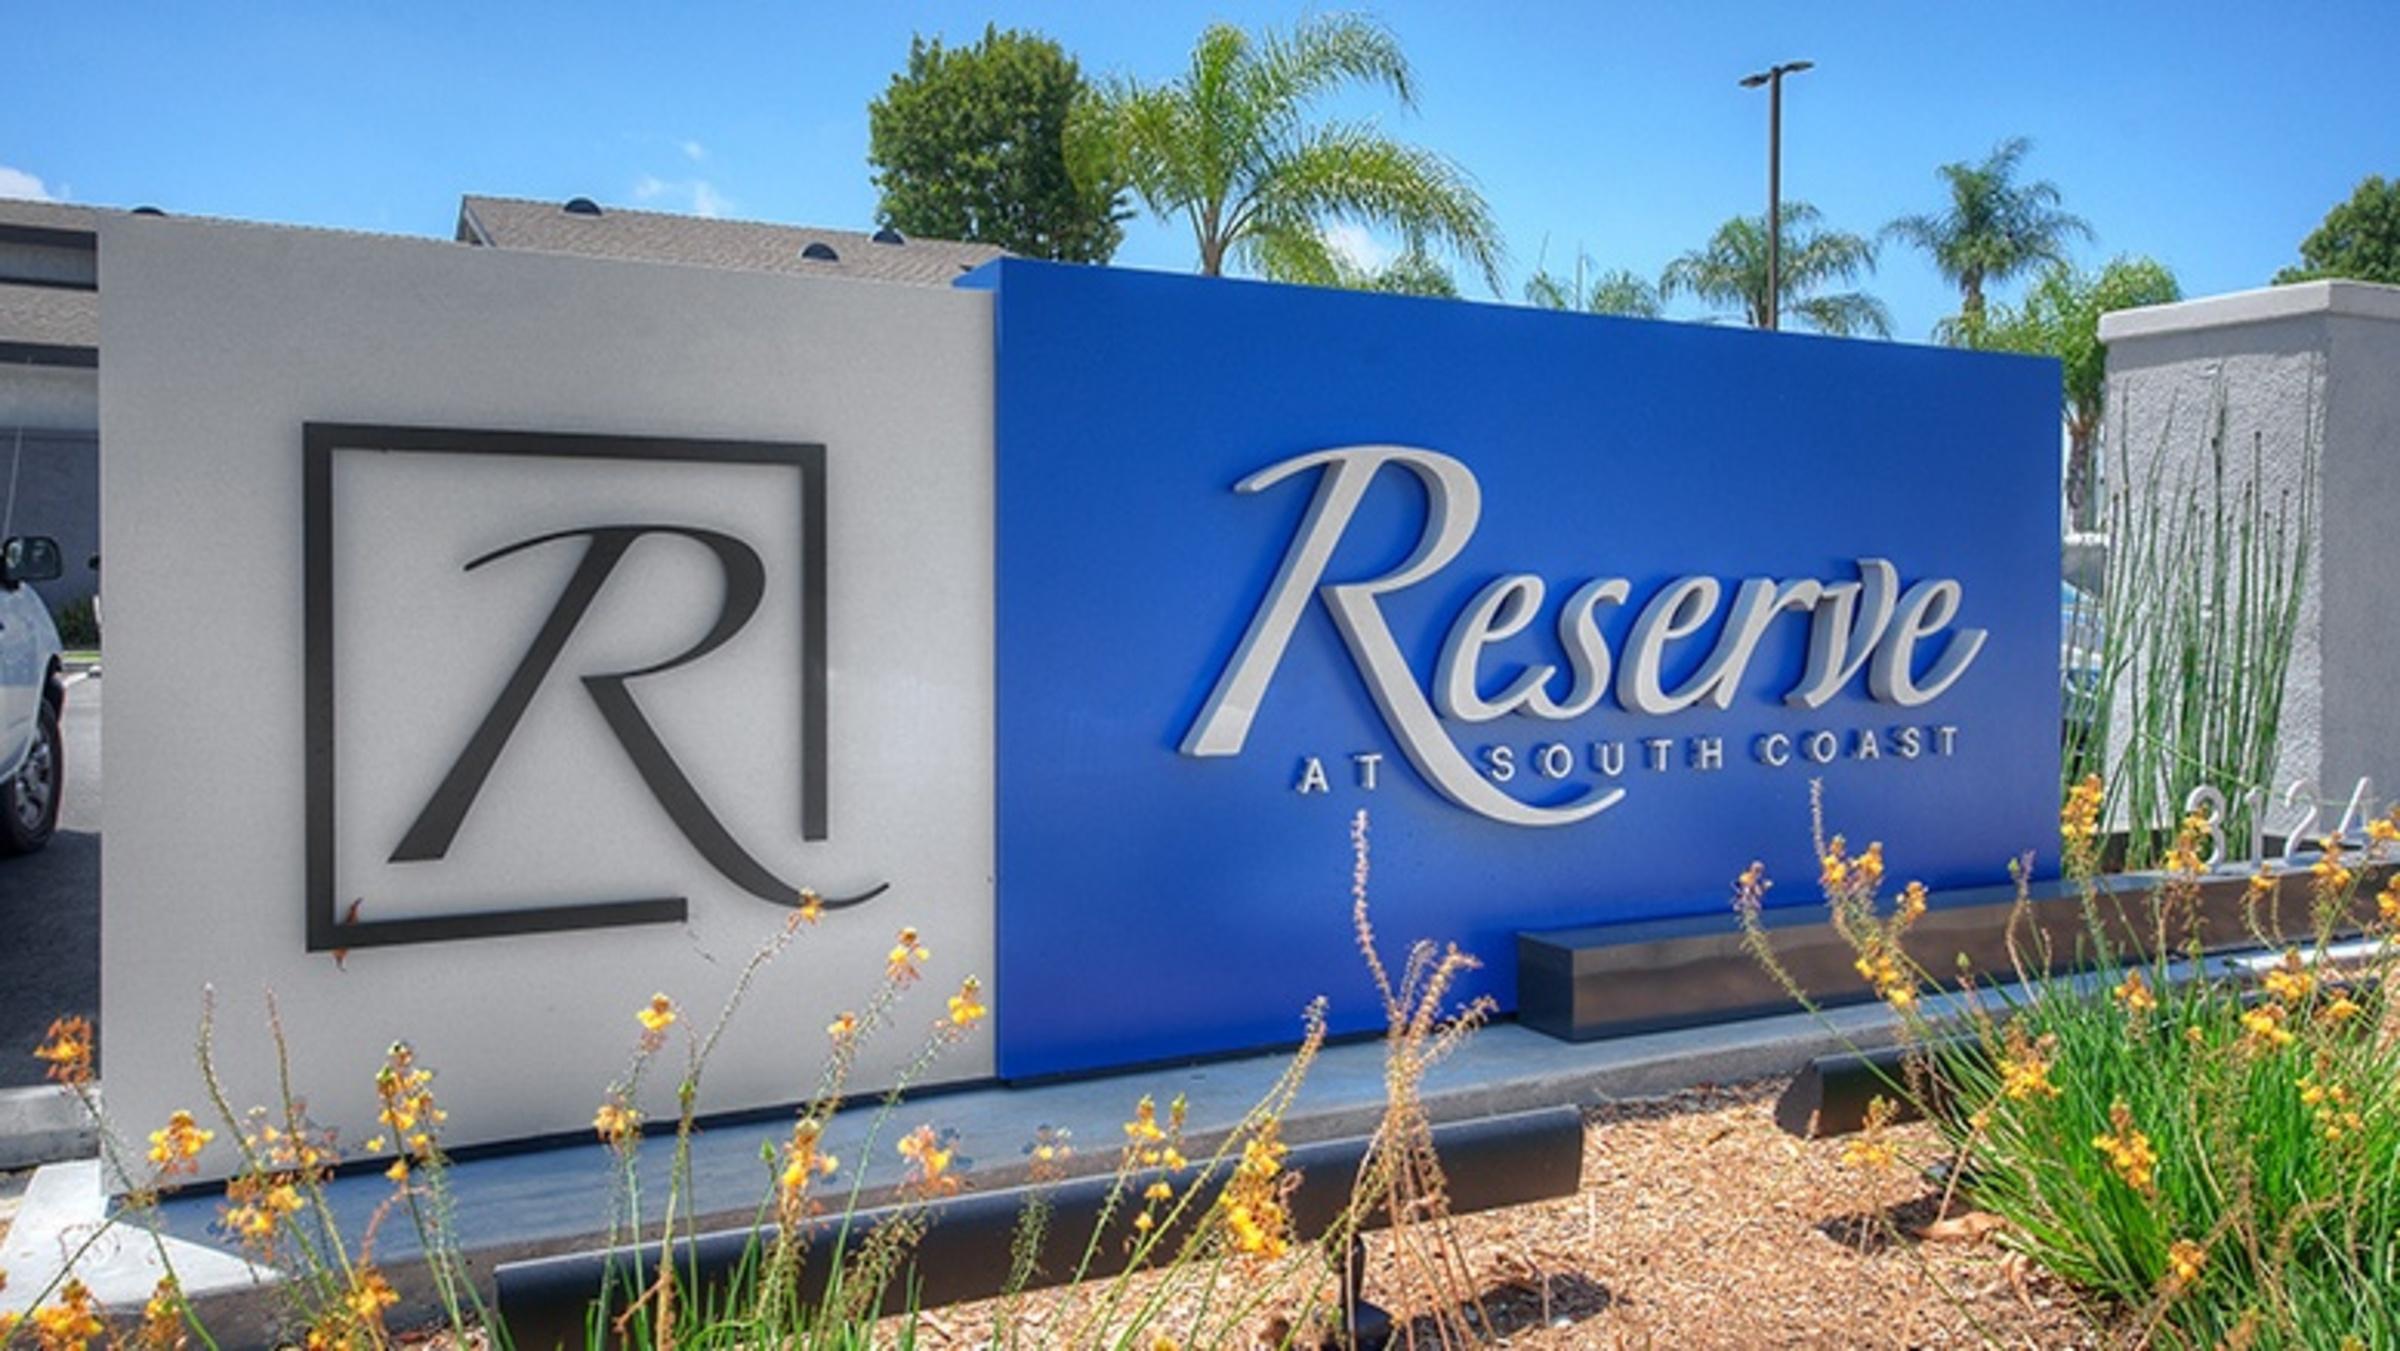 Reserve at South Coast